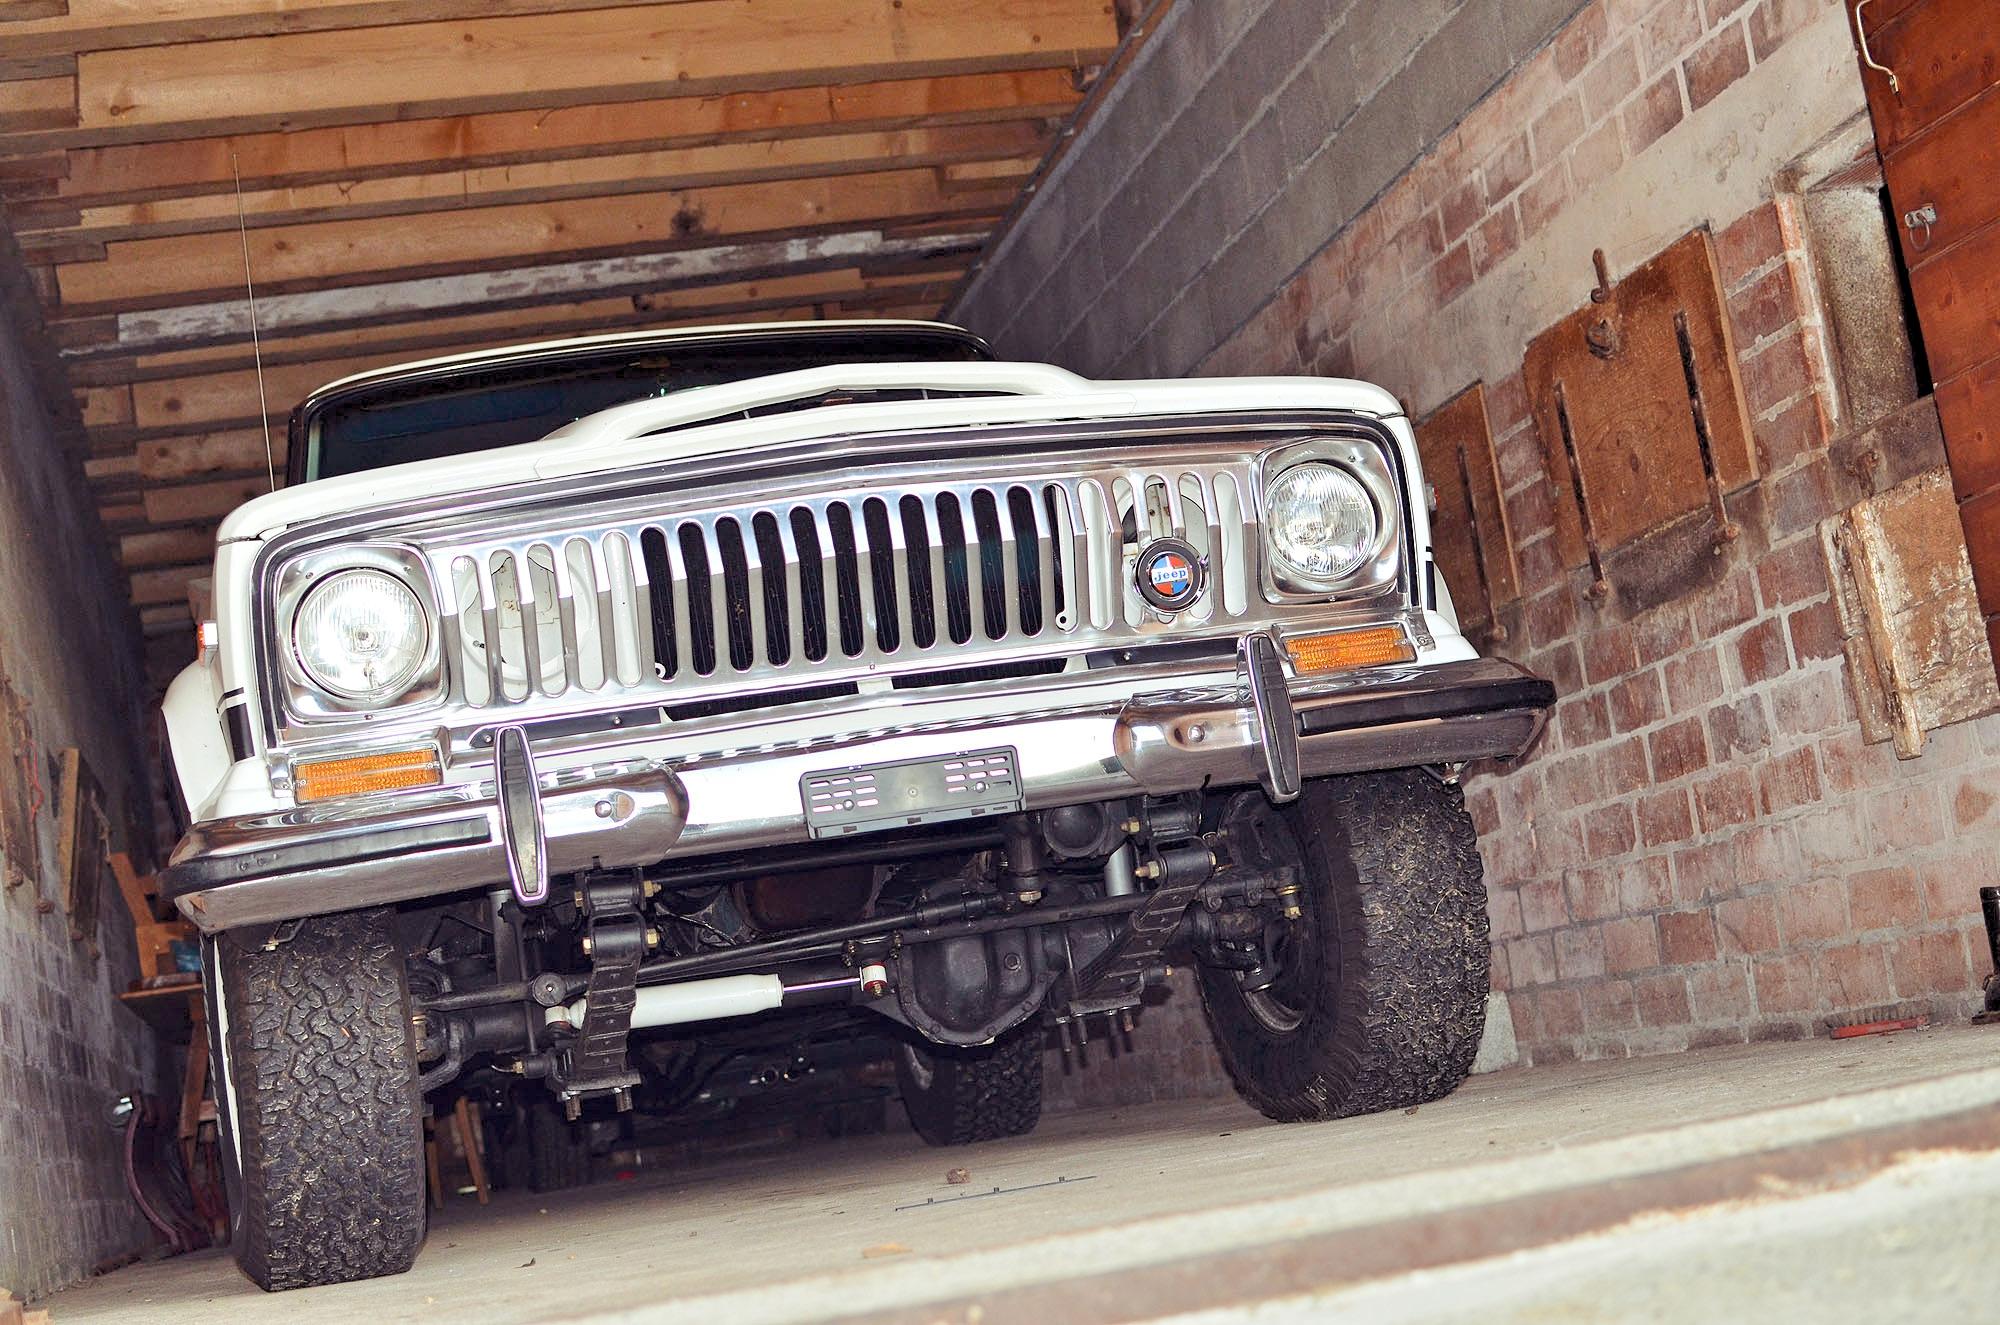 _jeep-cherokee-chief-valloire-004.JPG